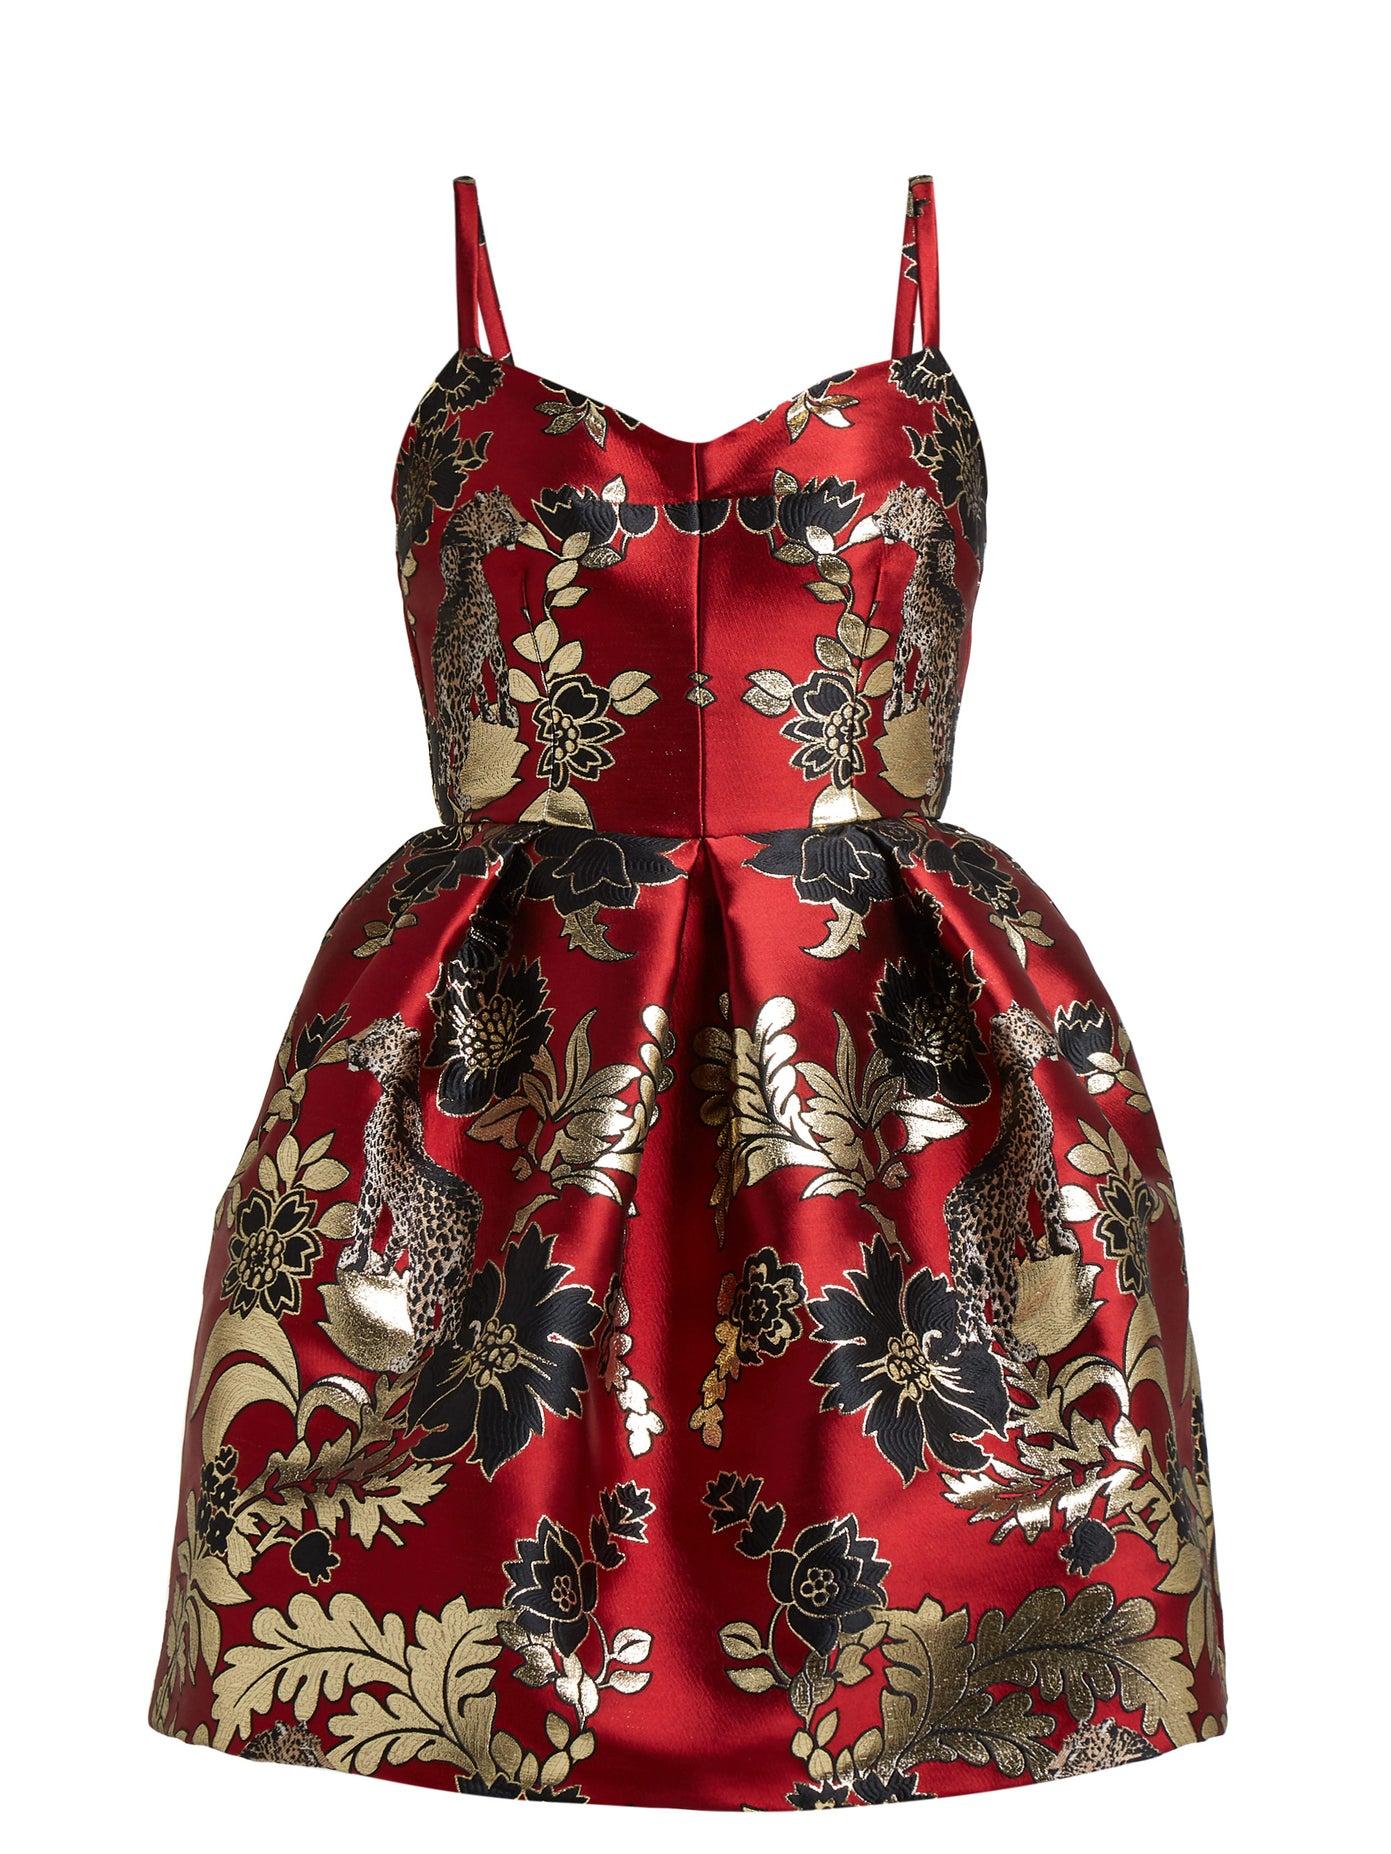 Dolce & Gabbana Red Brocade Mini Dress